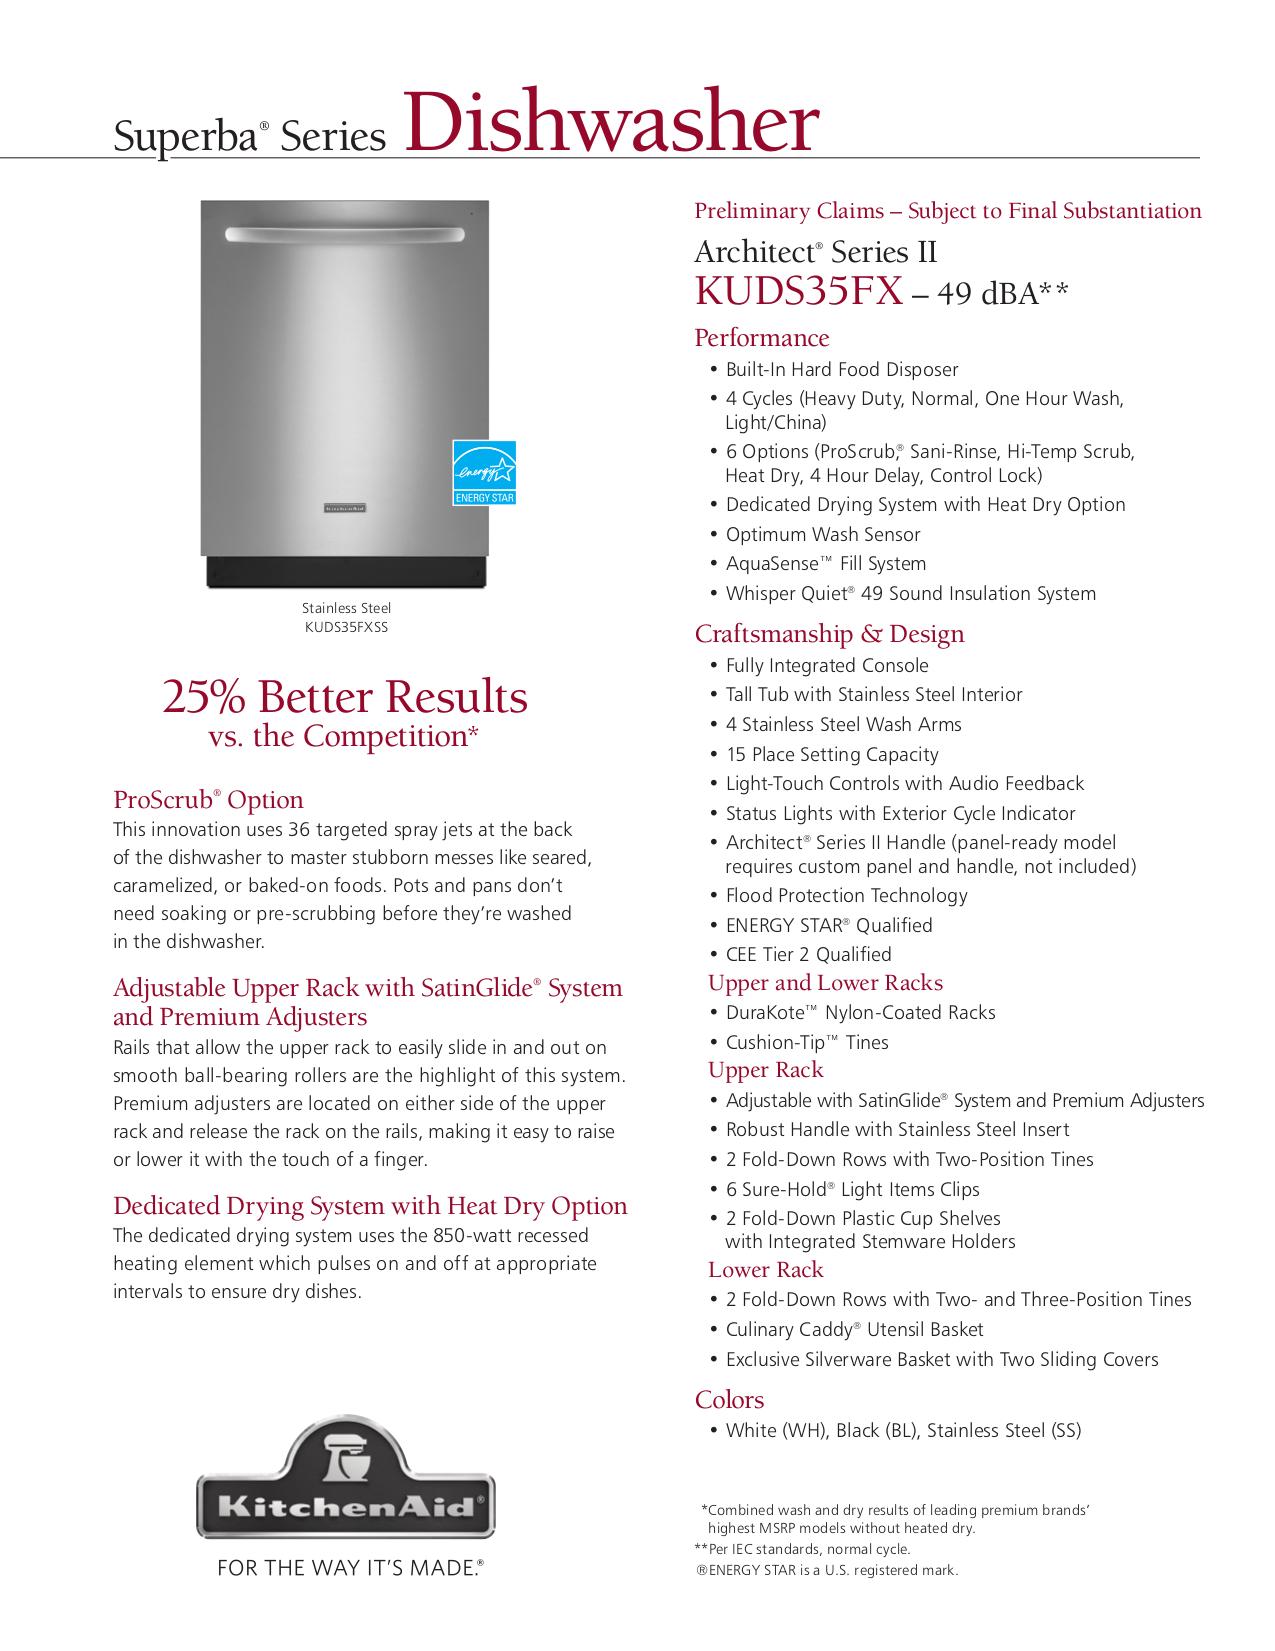 Pdf Manual For Kitchenaid Dishwasher Kuds35fxss Manual Guide